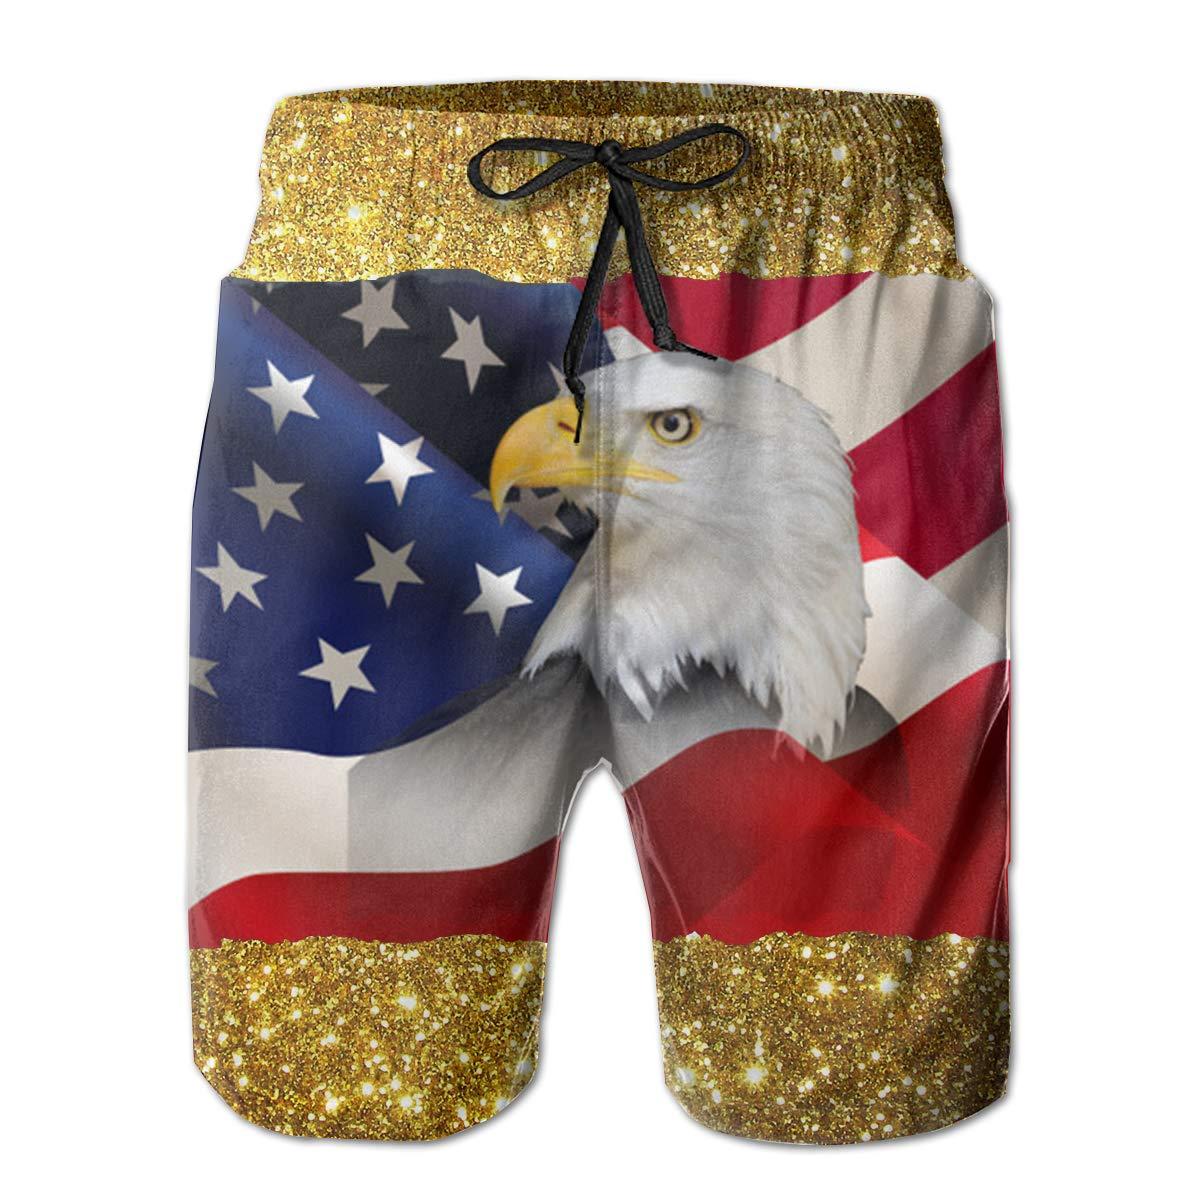 USA Flag with Bald Eagle Mens Swim Trunks Bathing Suit Beach Shorts